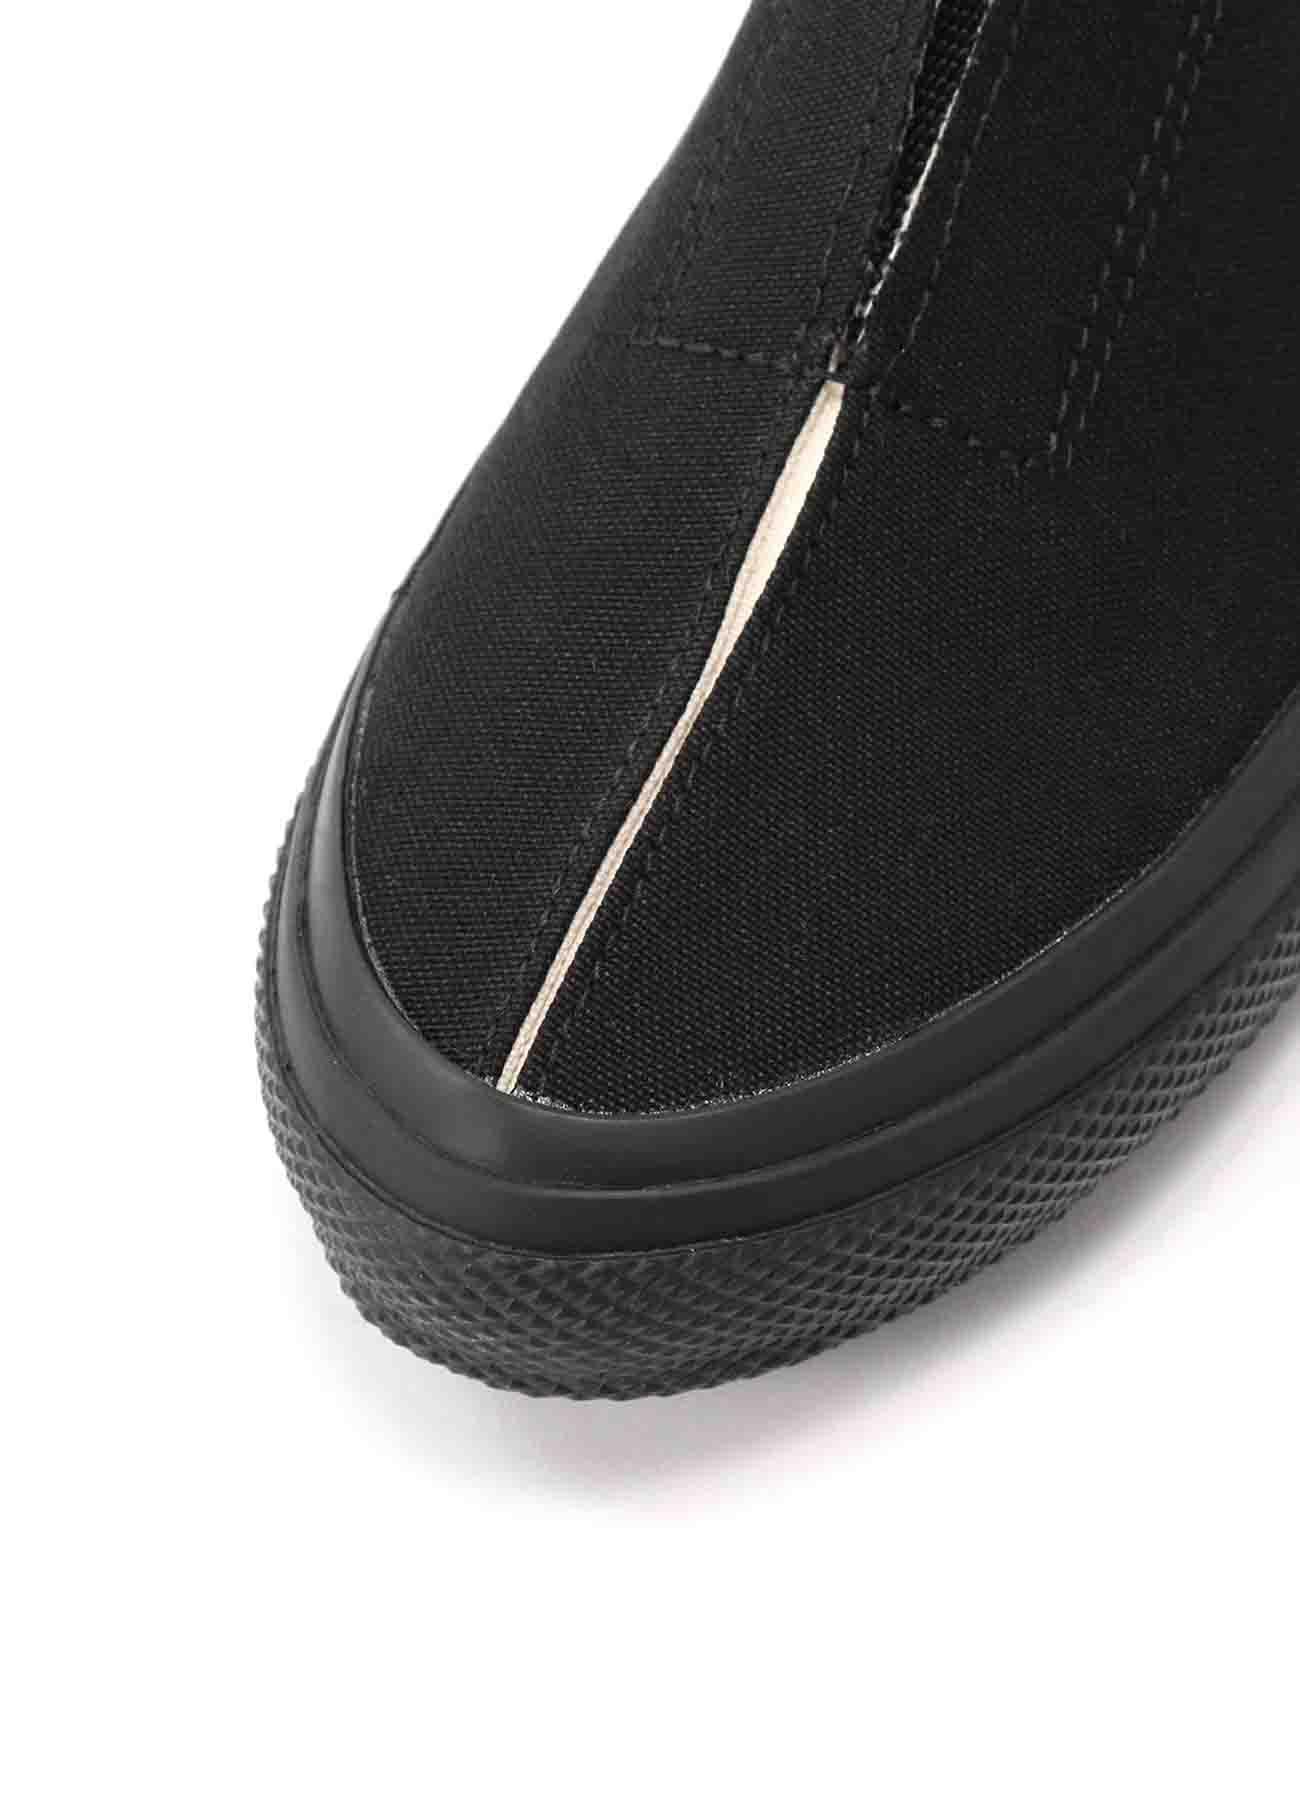 C/CANVAS GORE SLIP-ON SNEAKERS